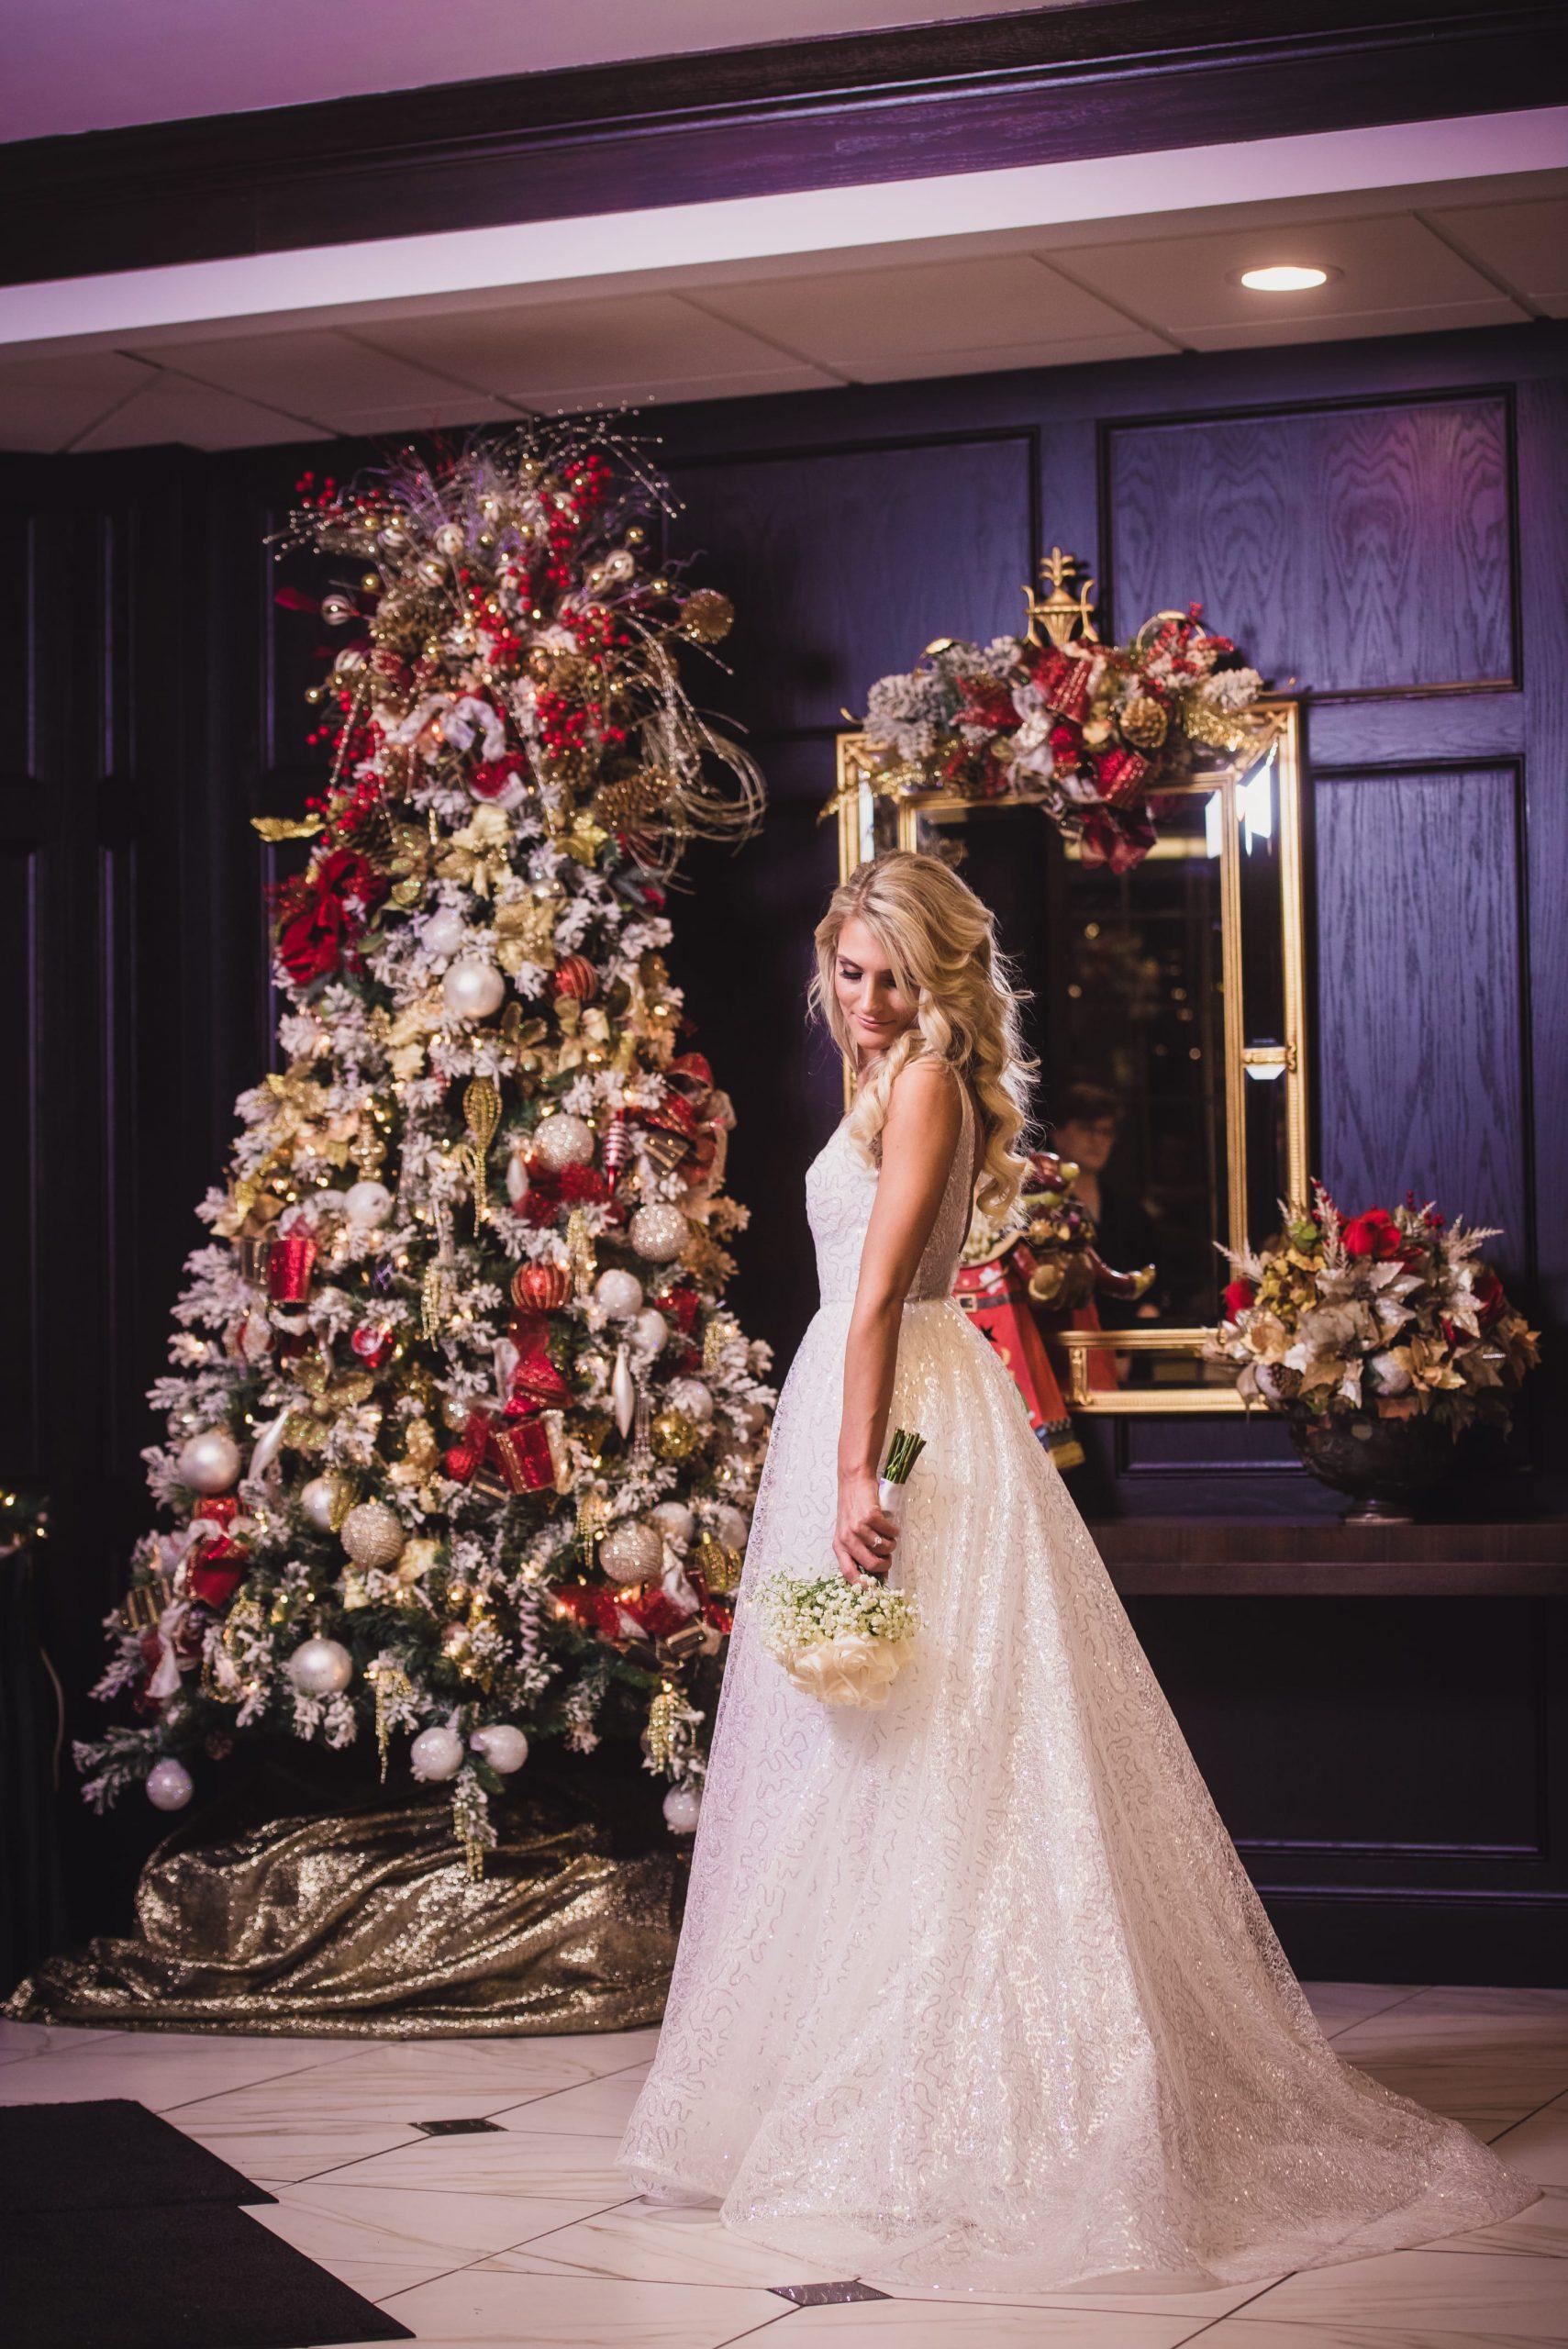 bride by Christmas tree